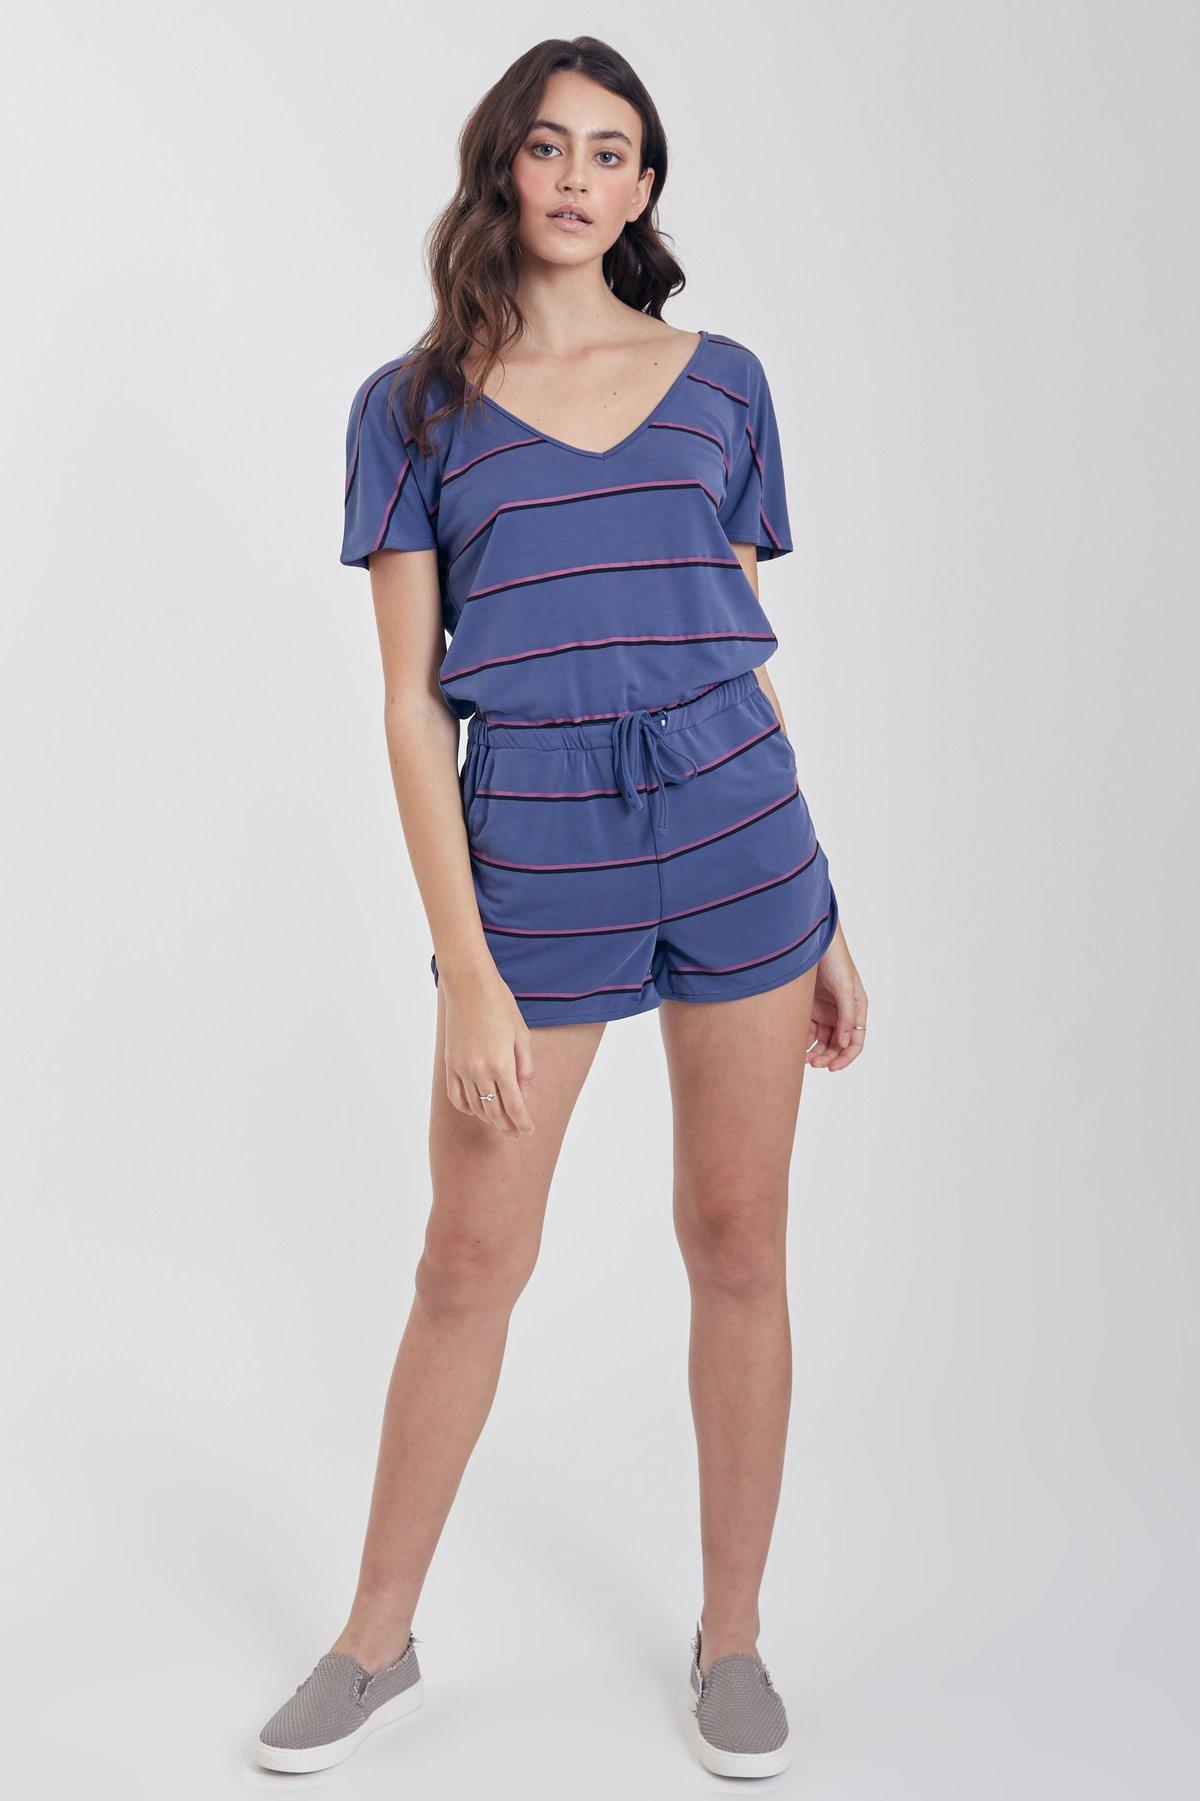 Denim/Magenta Stripe Casual Romper